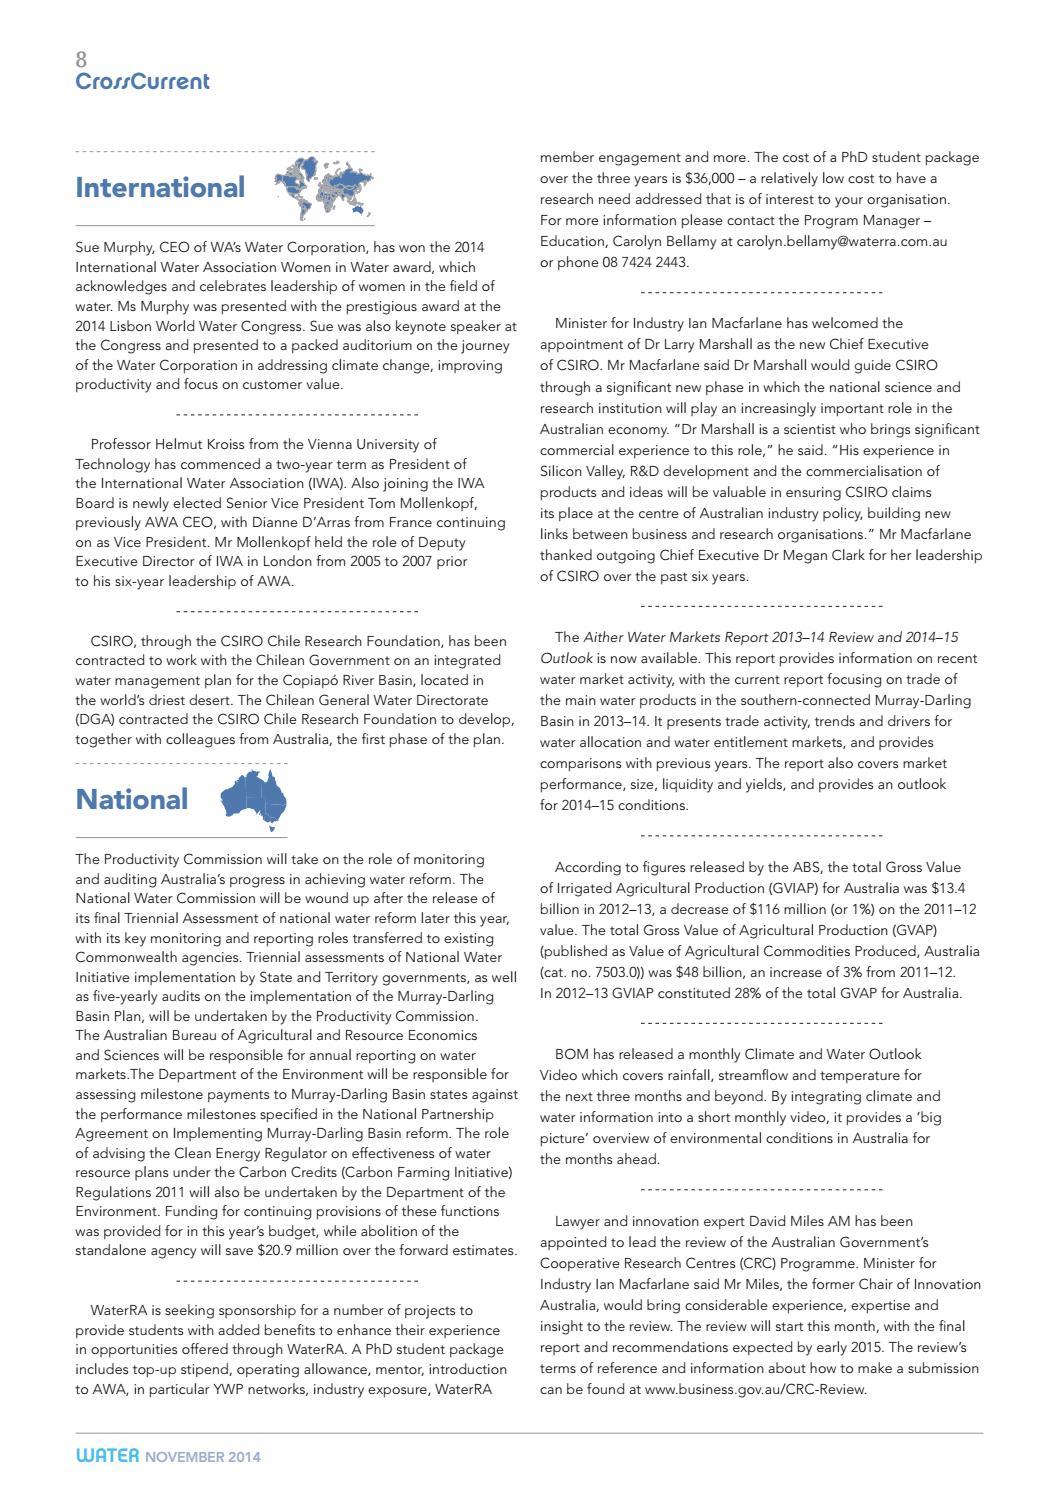 Water Journal November 2014 by australianwater - issuu